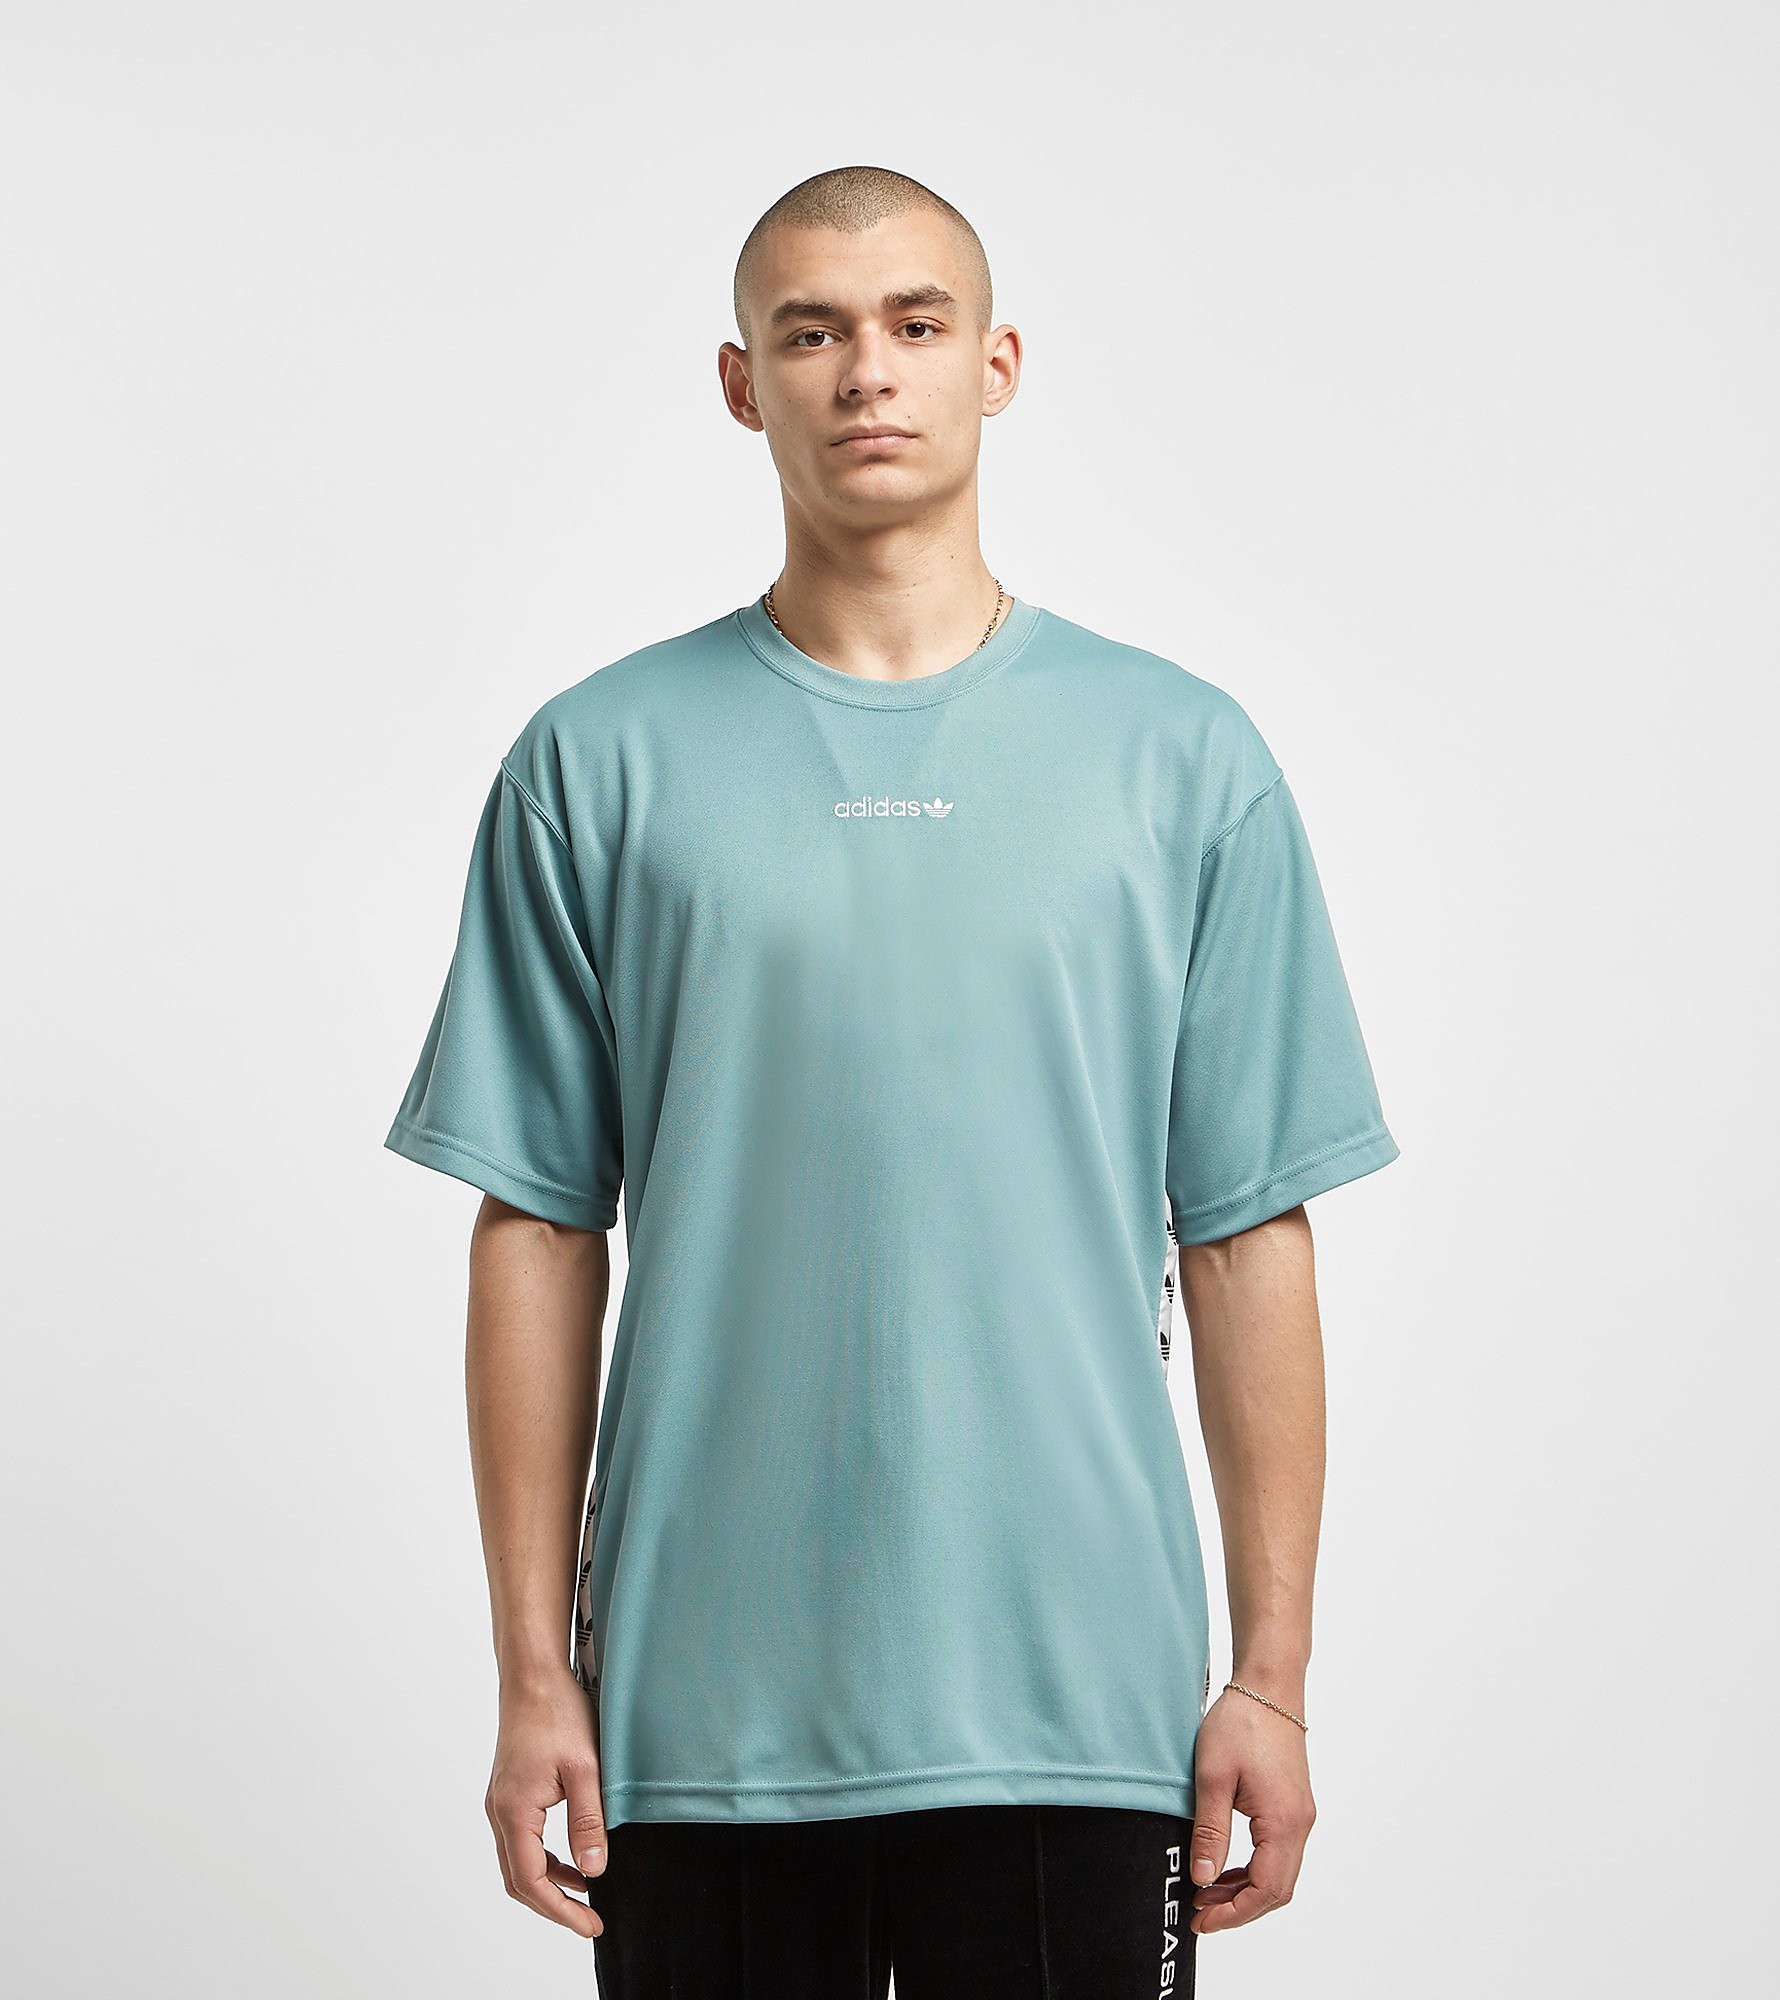 adidas Originals TNT Tape T-Shirt - size? Exclusive, Grijs